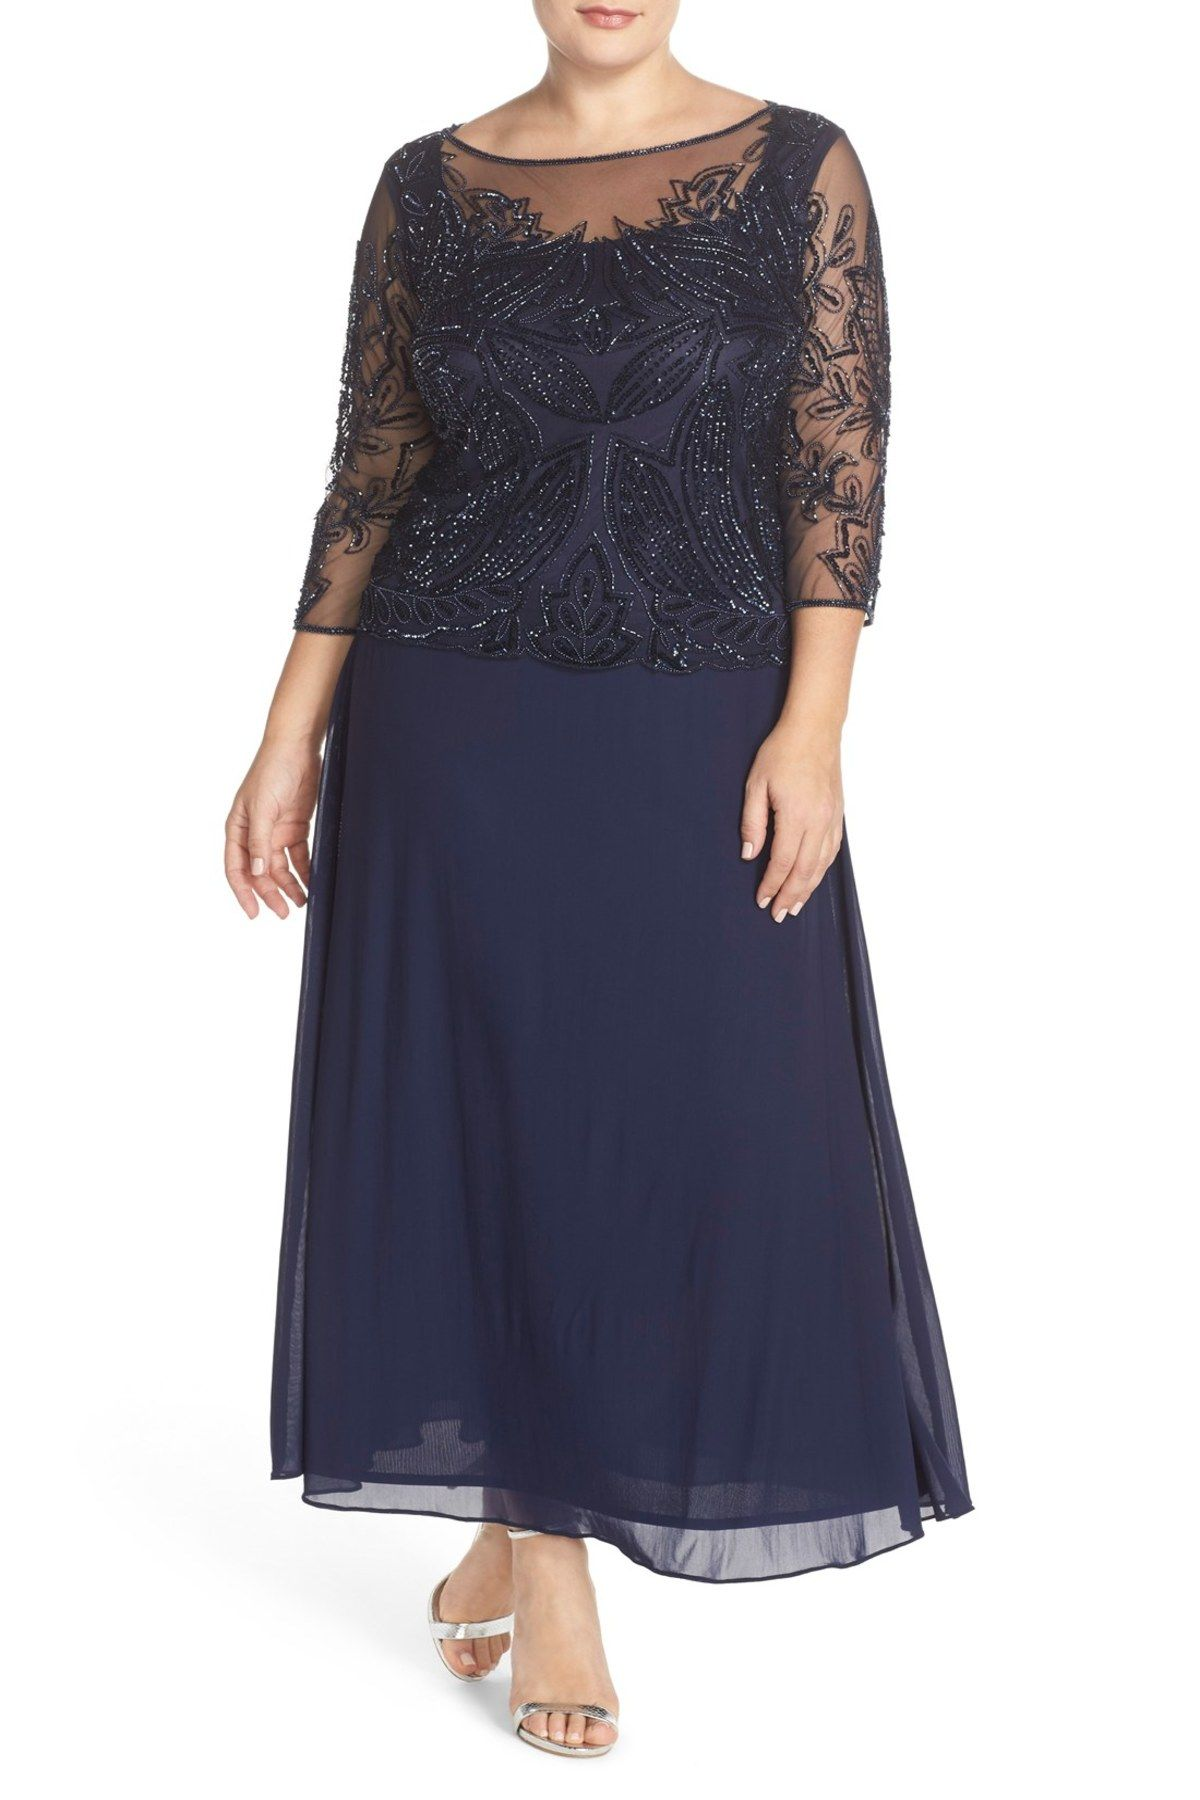 a8f5e7dfca Pisarro Nights Illusion Neck Beaded A-Line Gown (Plus Size) in 2019 .